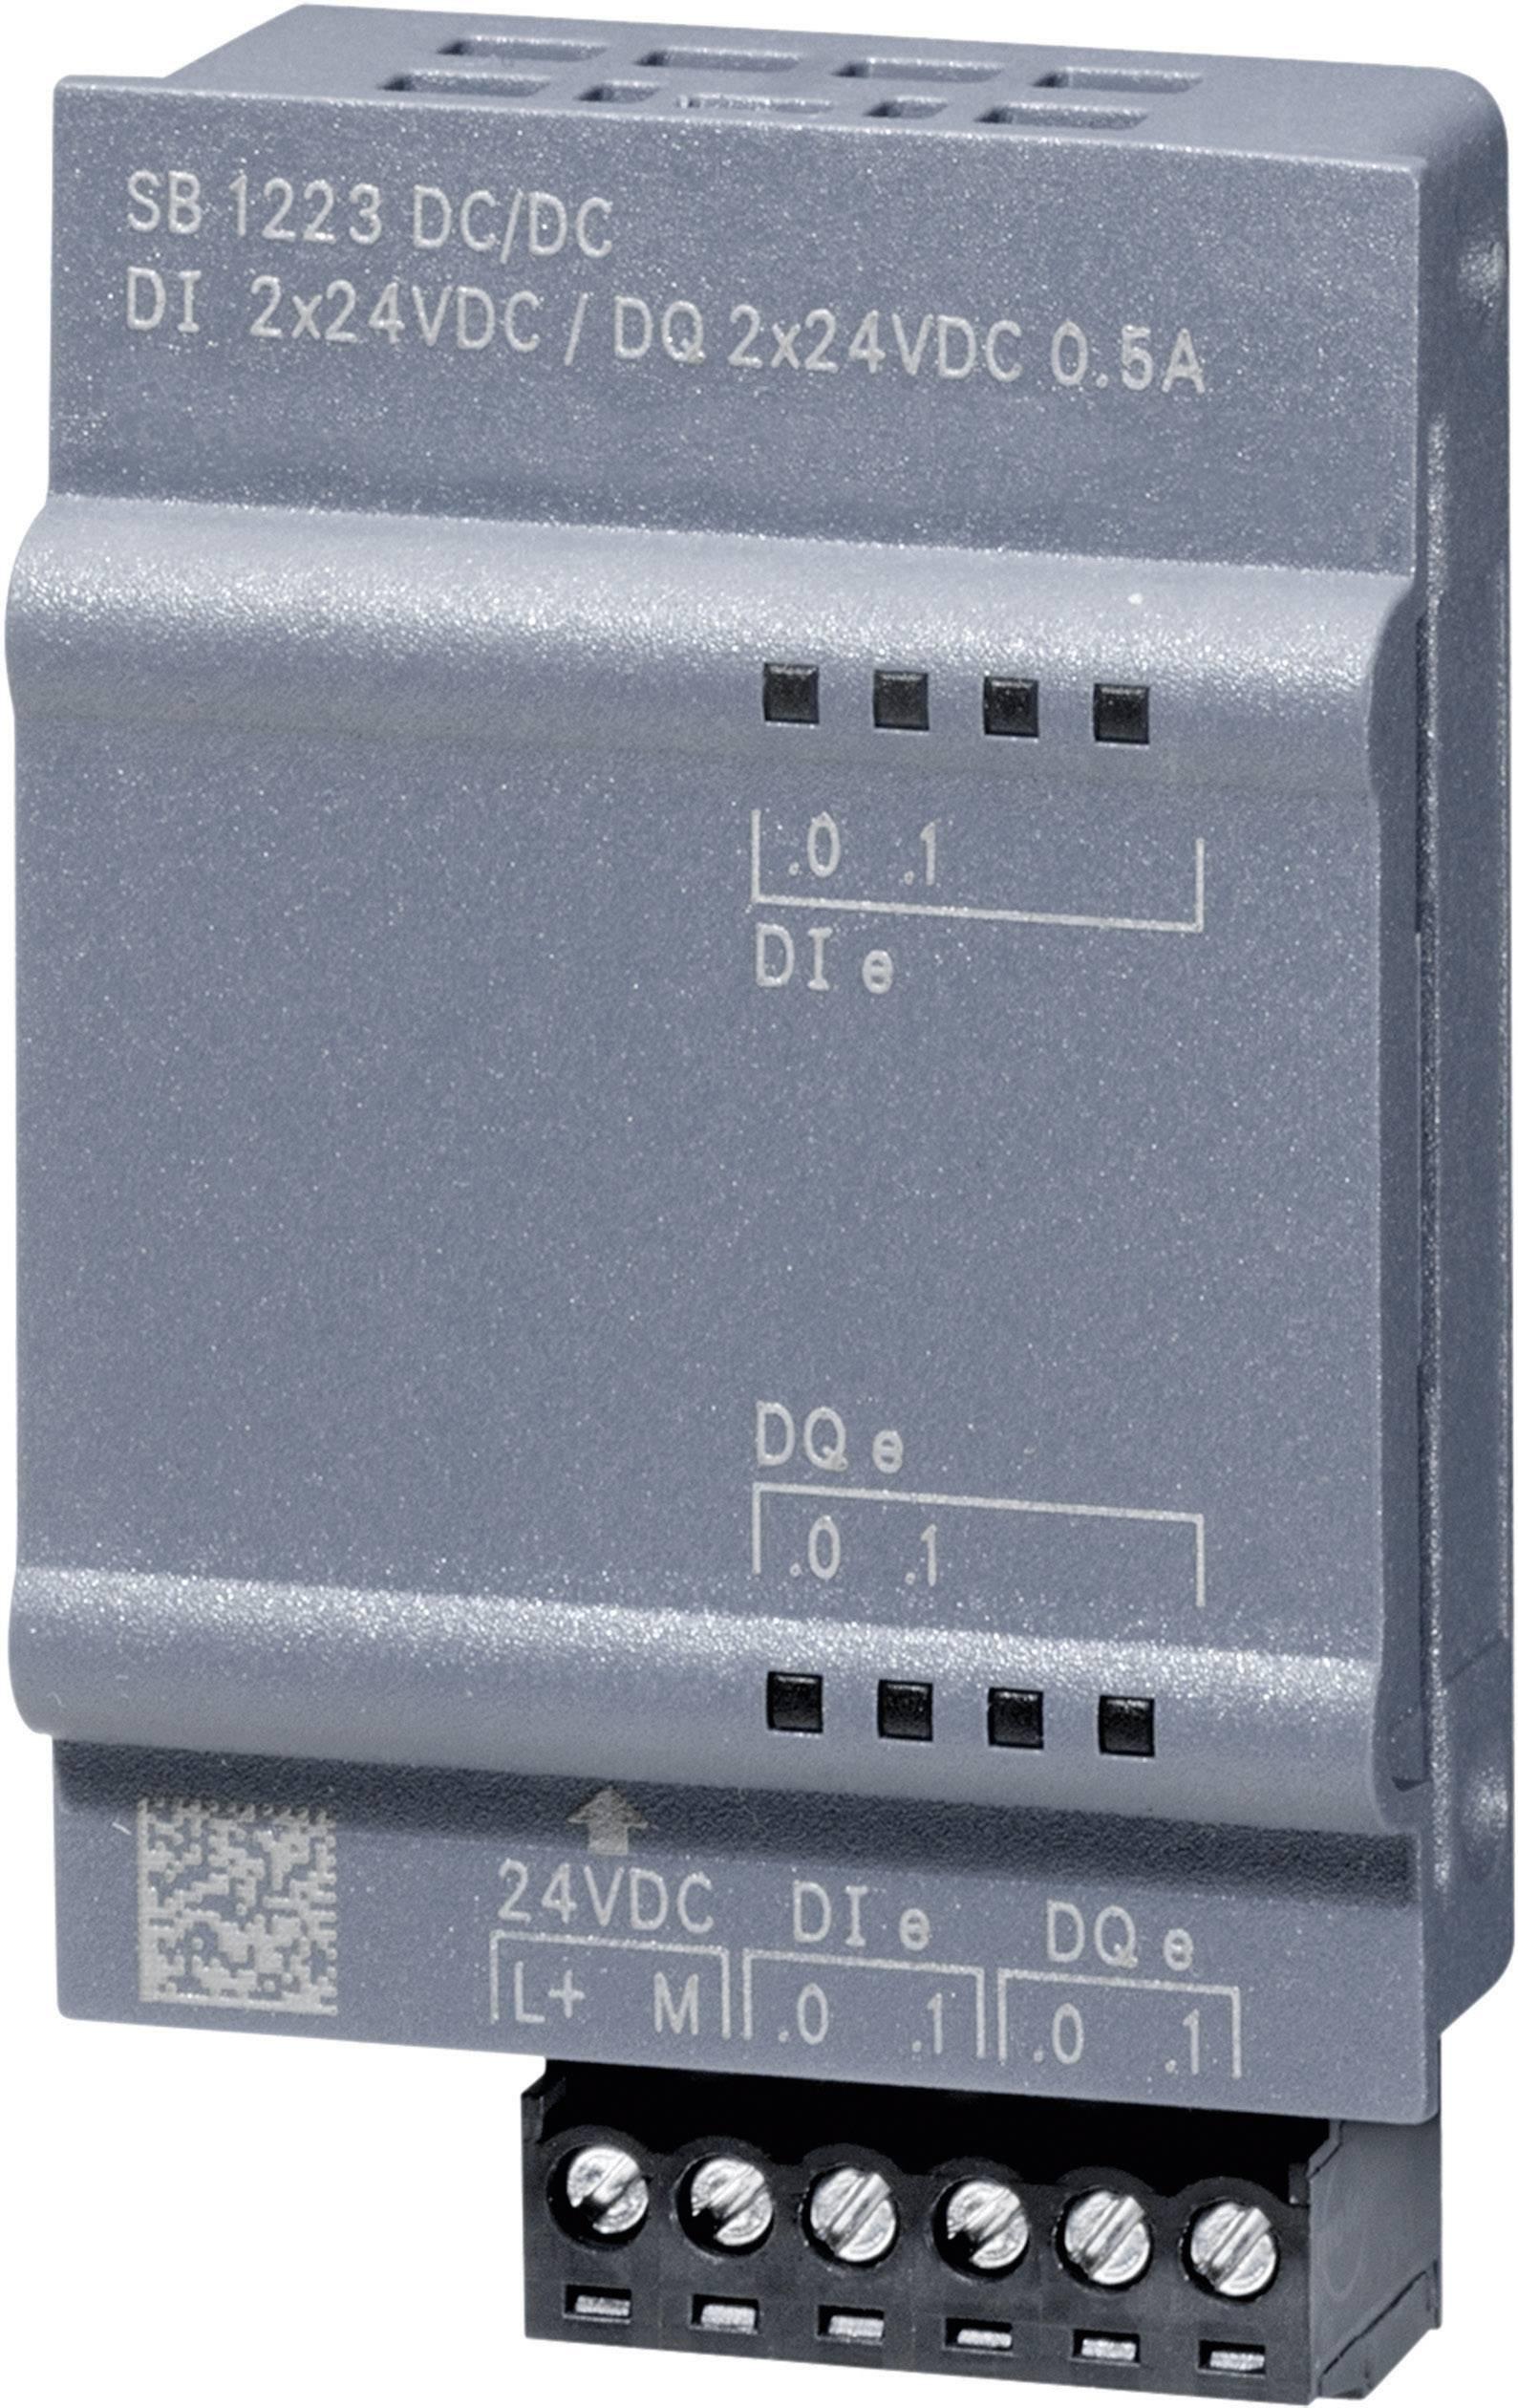 PLC analogue input module Siemens SB 1231 6ES7231-4HA30-0XB0